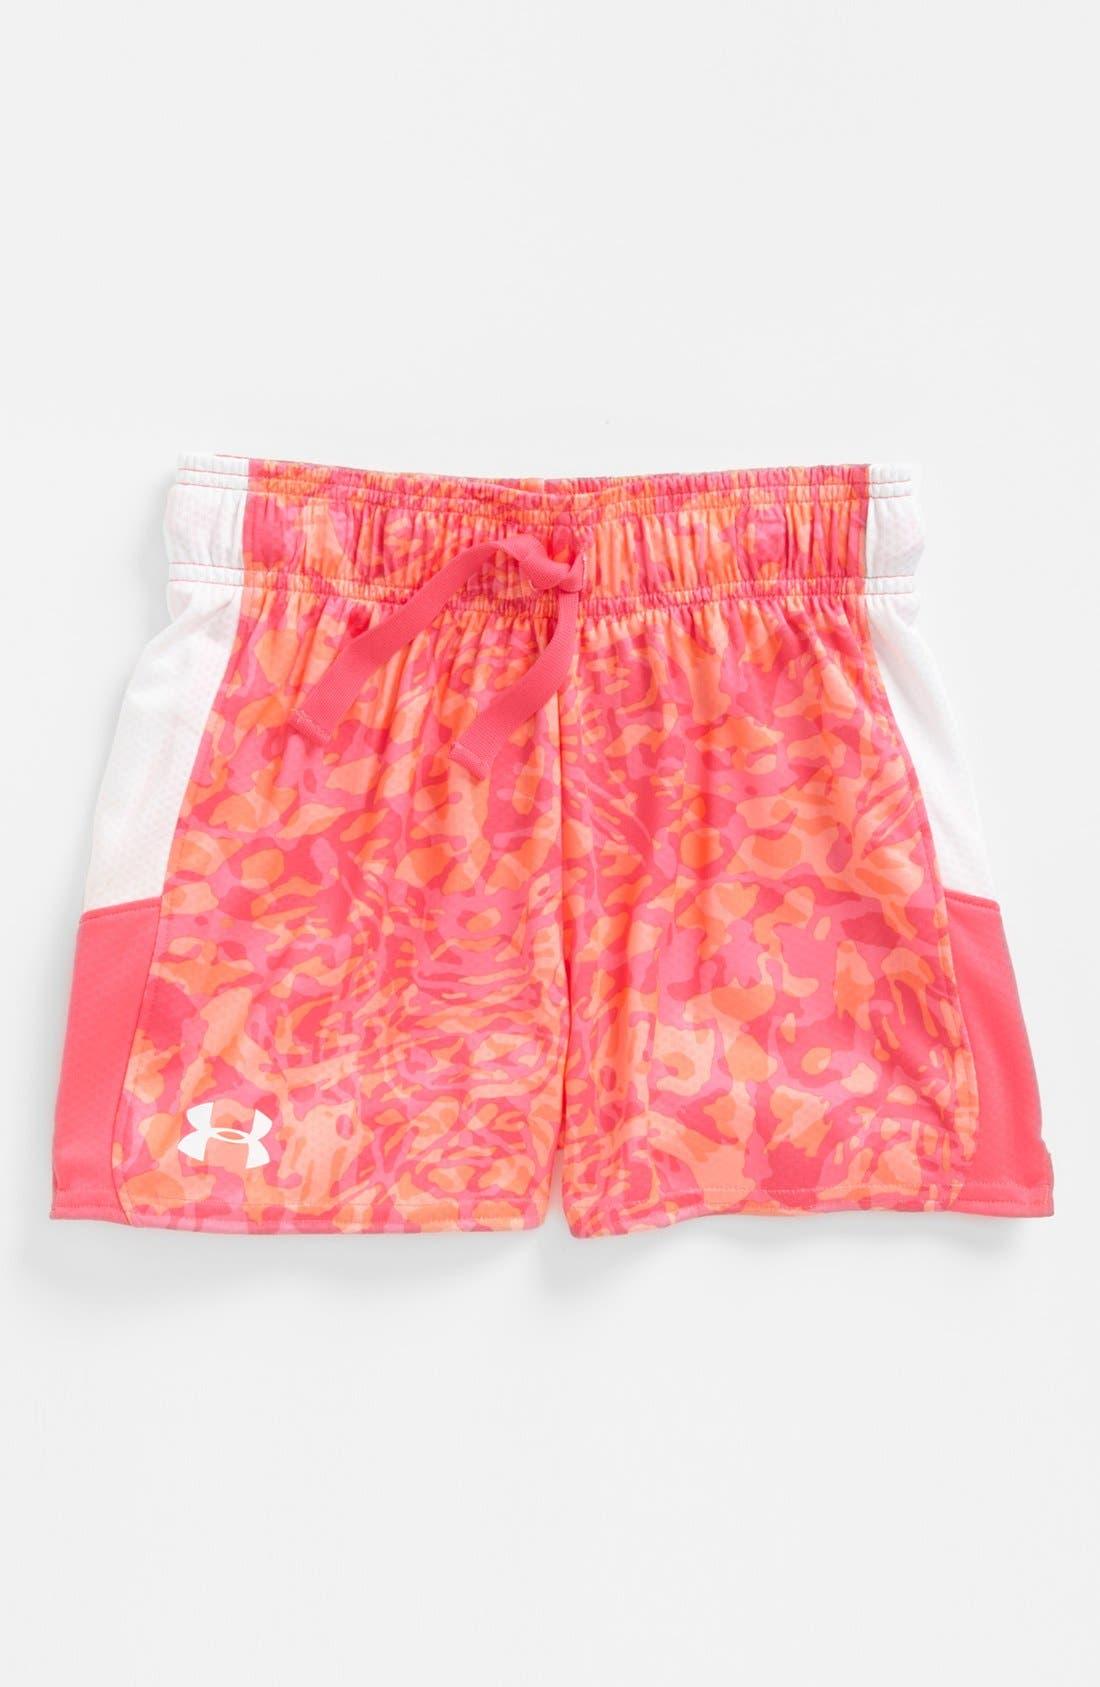 Alternate Image 1 Selected - Under Armour 'Intensity' HeatGear® Shorts (Little Girls & Big Girls)